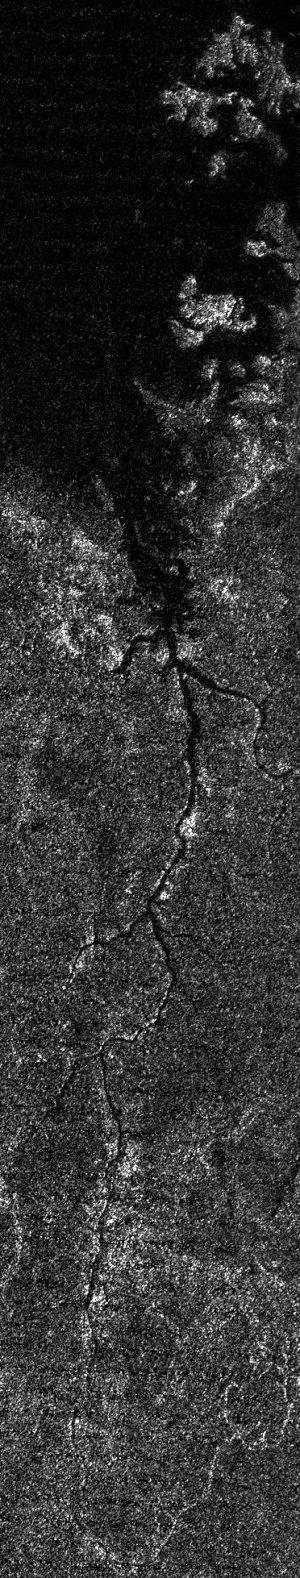 NASA, JPL-Caltech, ASI